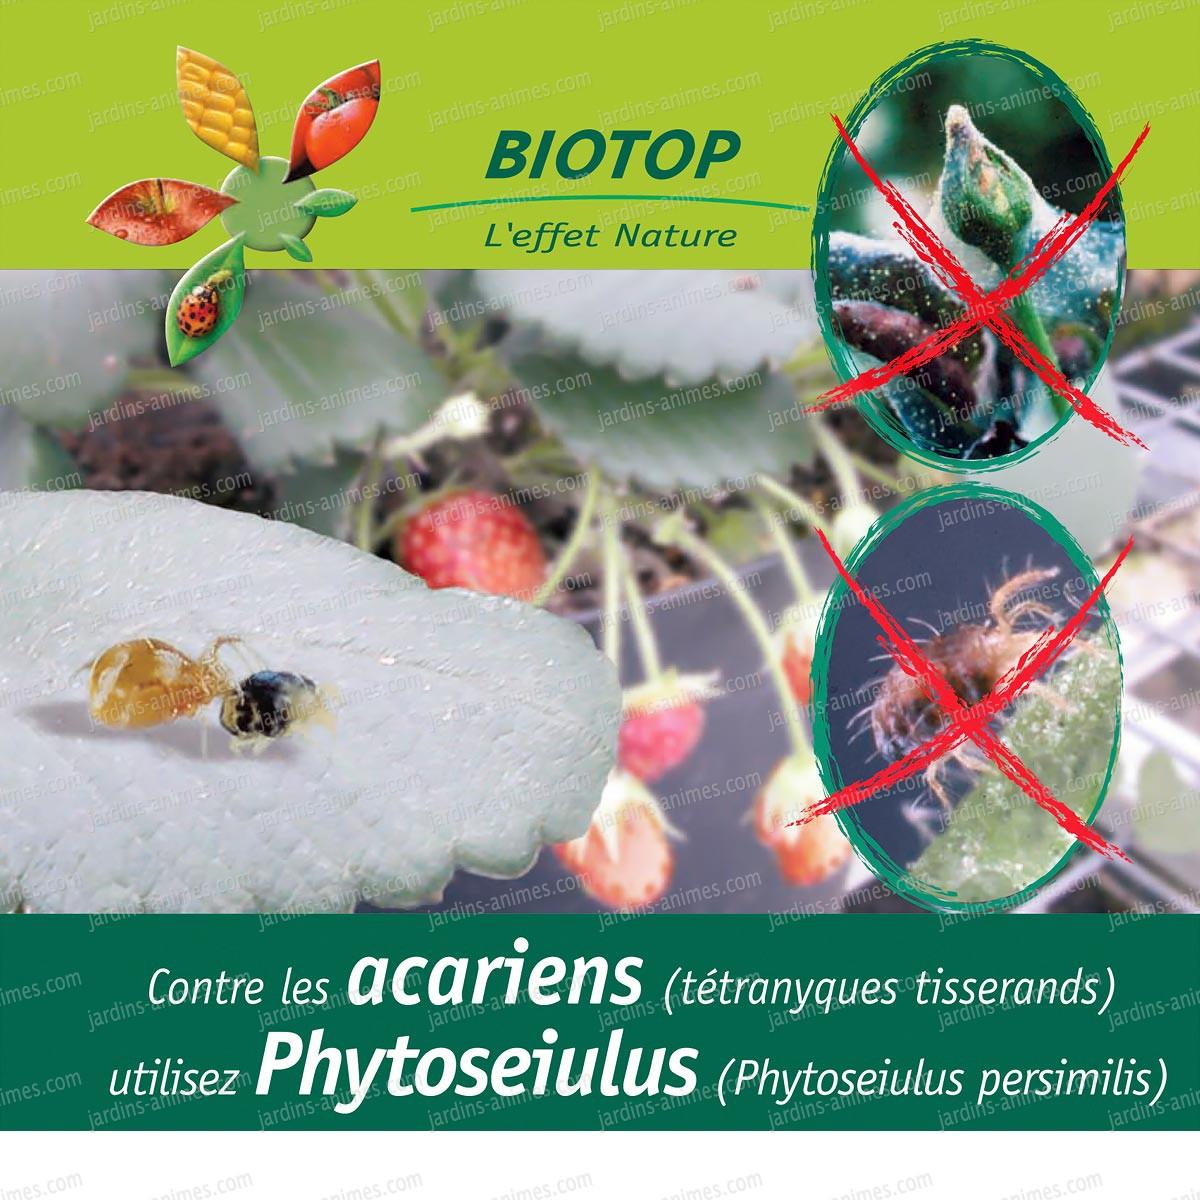 phytoseiulus contre acariens araign es rouges t tranyque tisserand anti pucerons cochenille bio. Black Bedroom Furniture Sets. Home Design Ideas